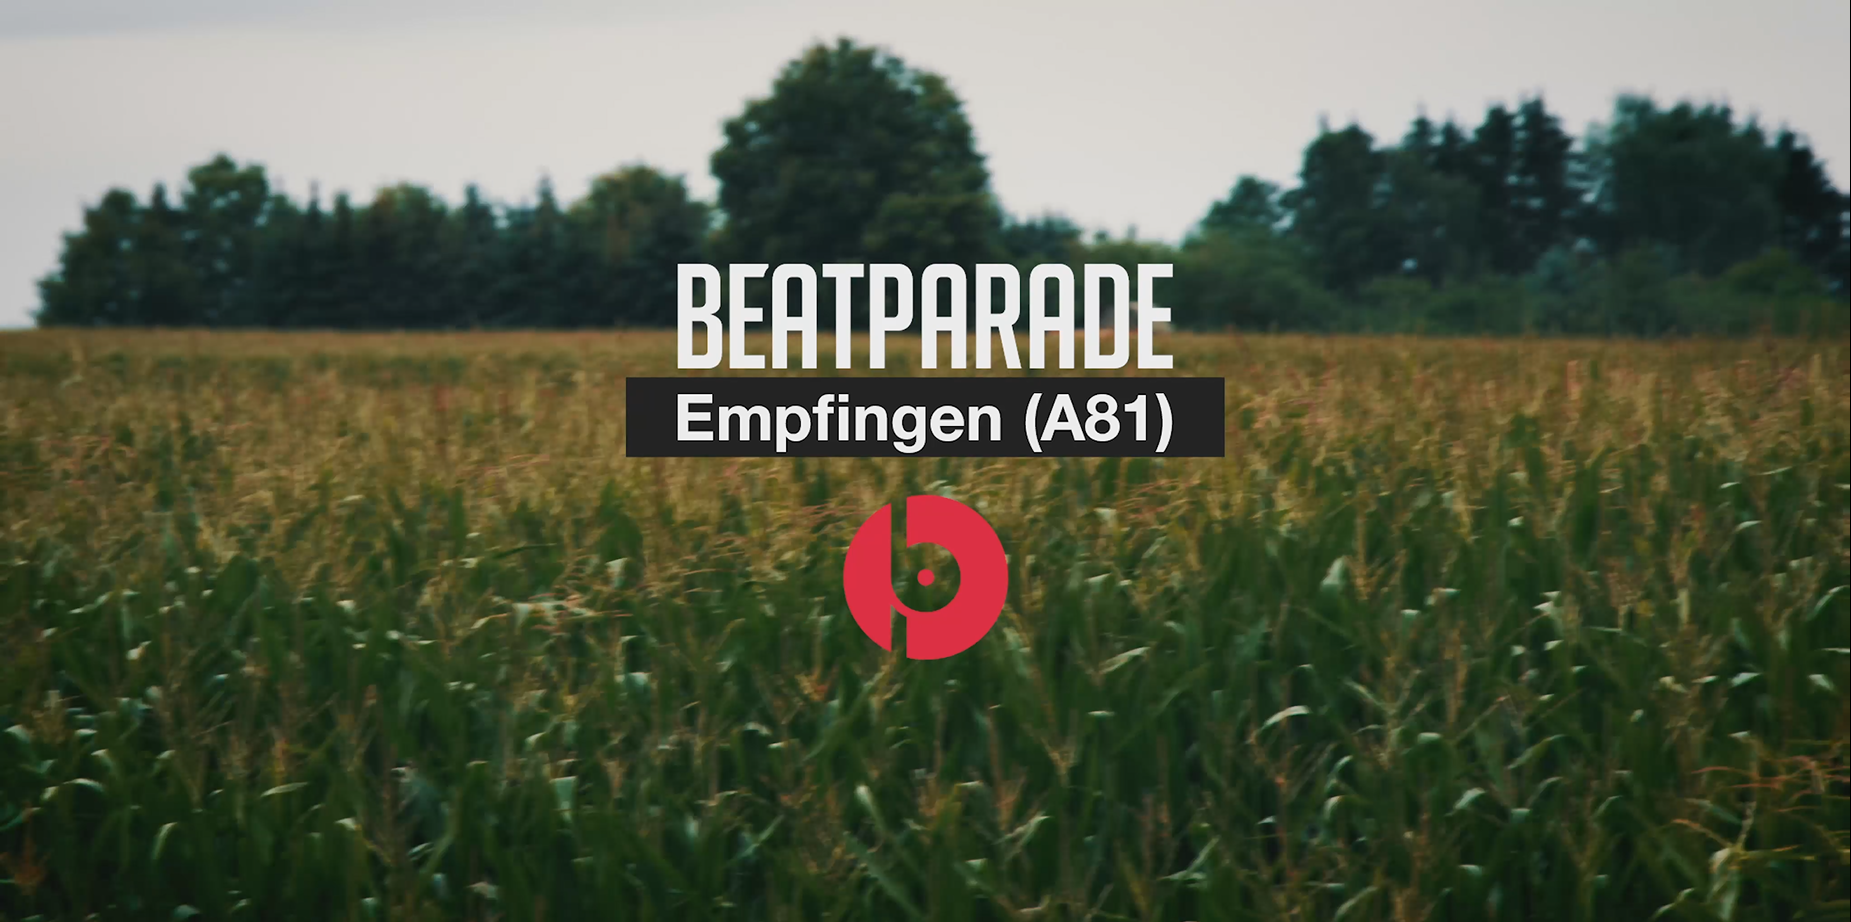 BEATPARADE 2018 - Aftermovie-Teaser